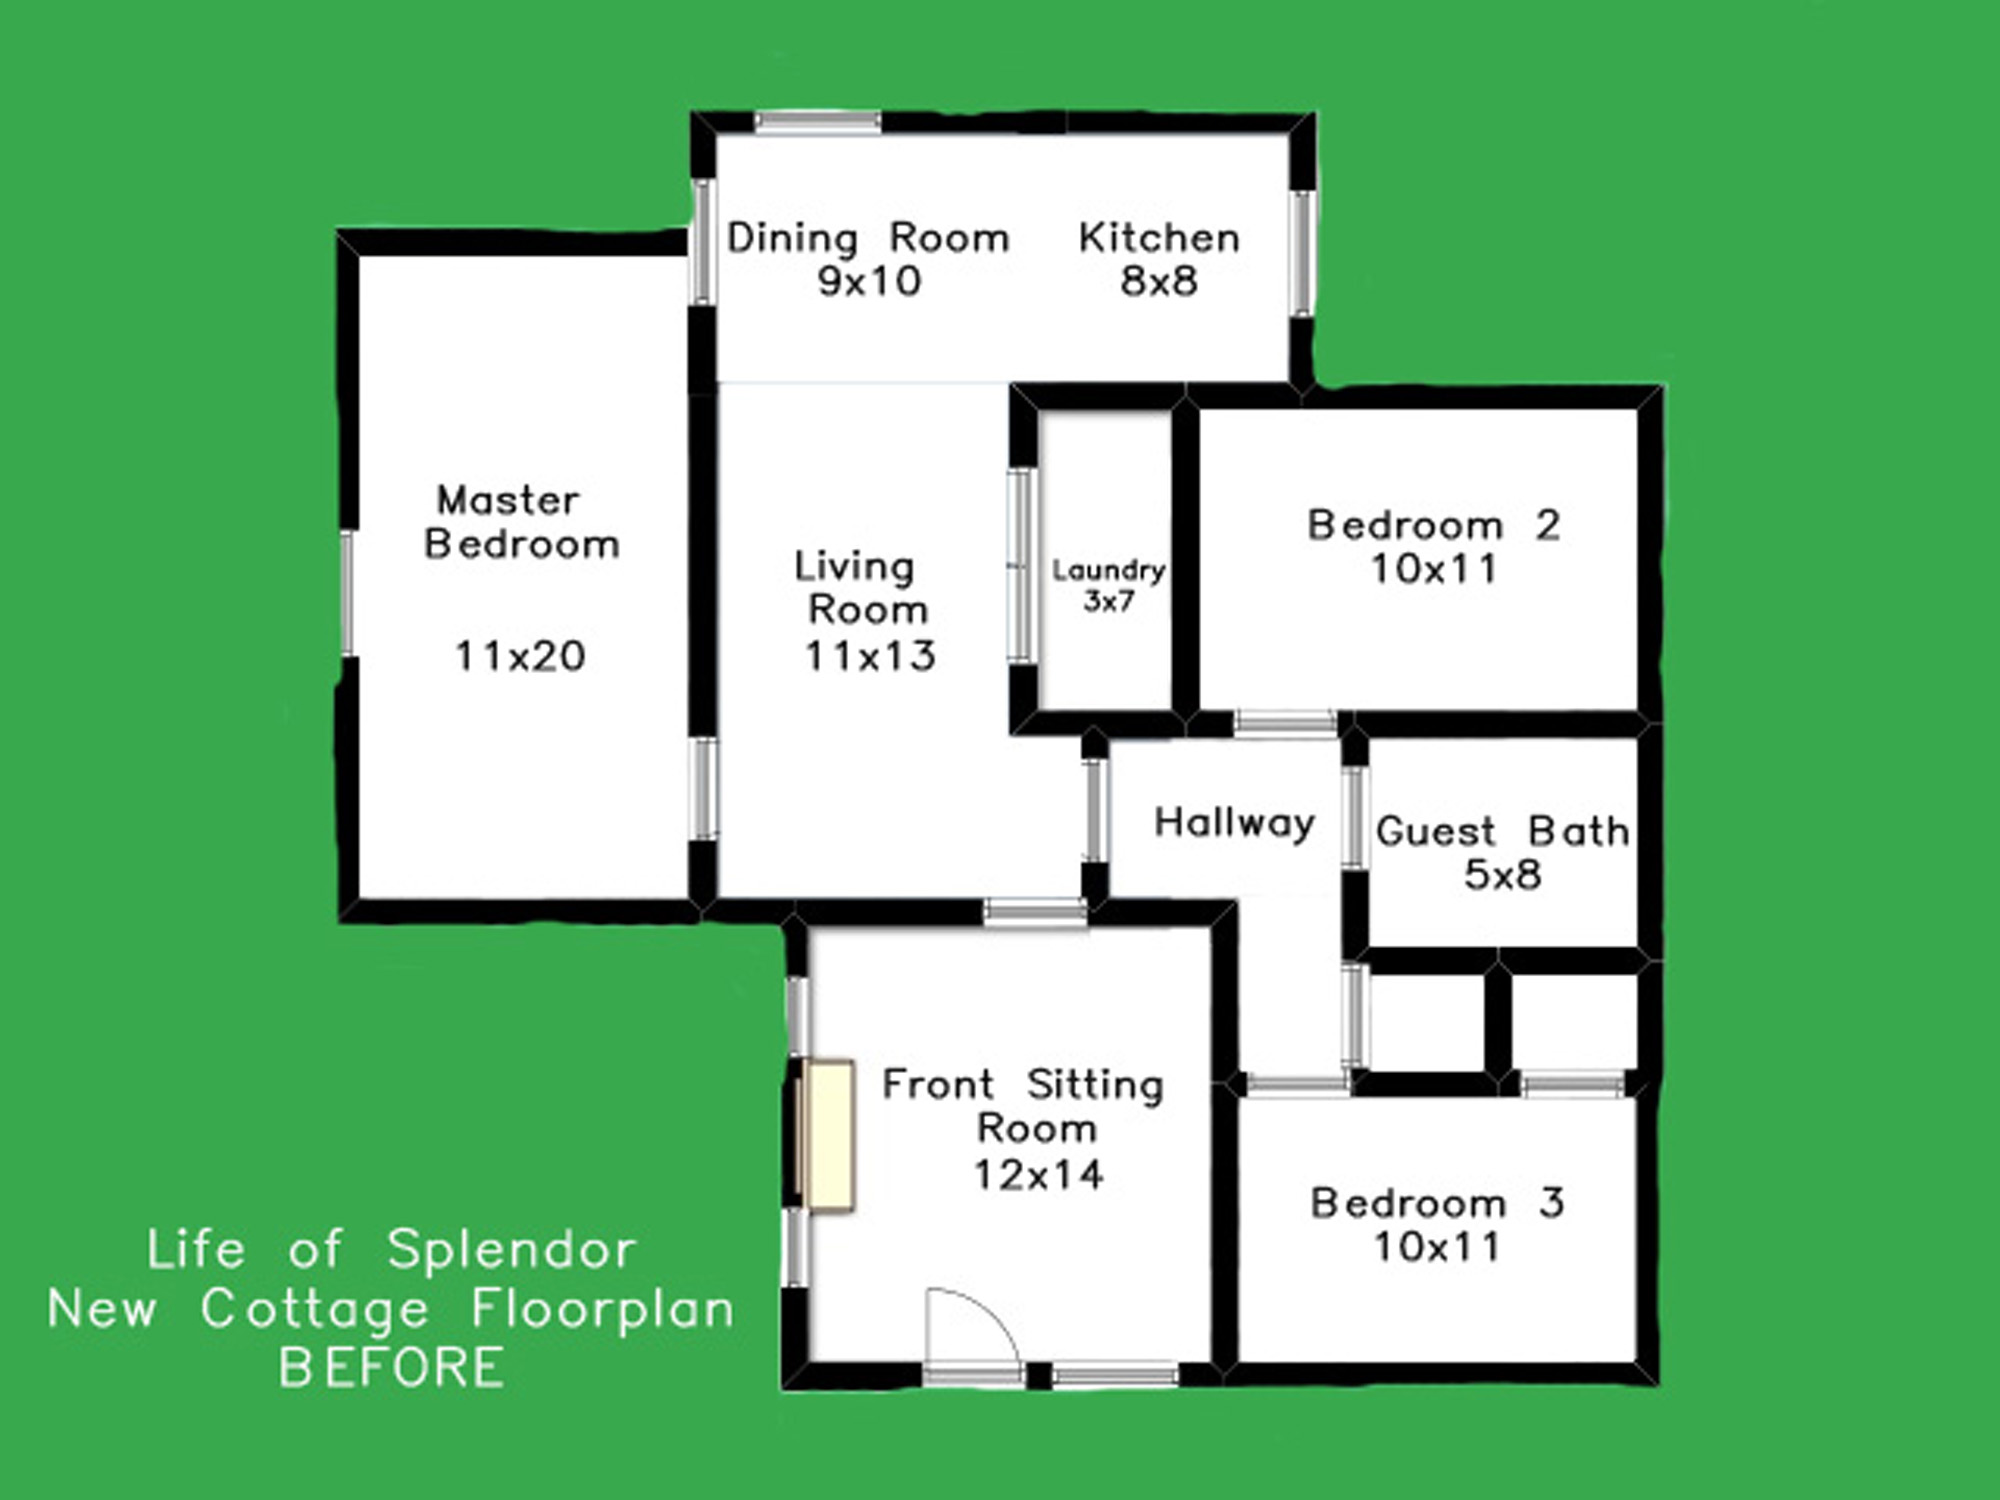 Life of Splendor Cottage Floorplan BEFORE